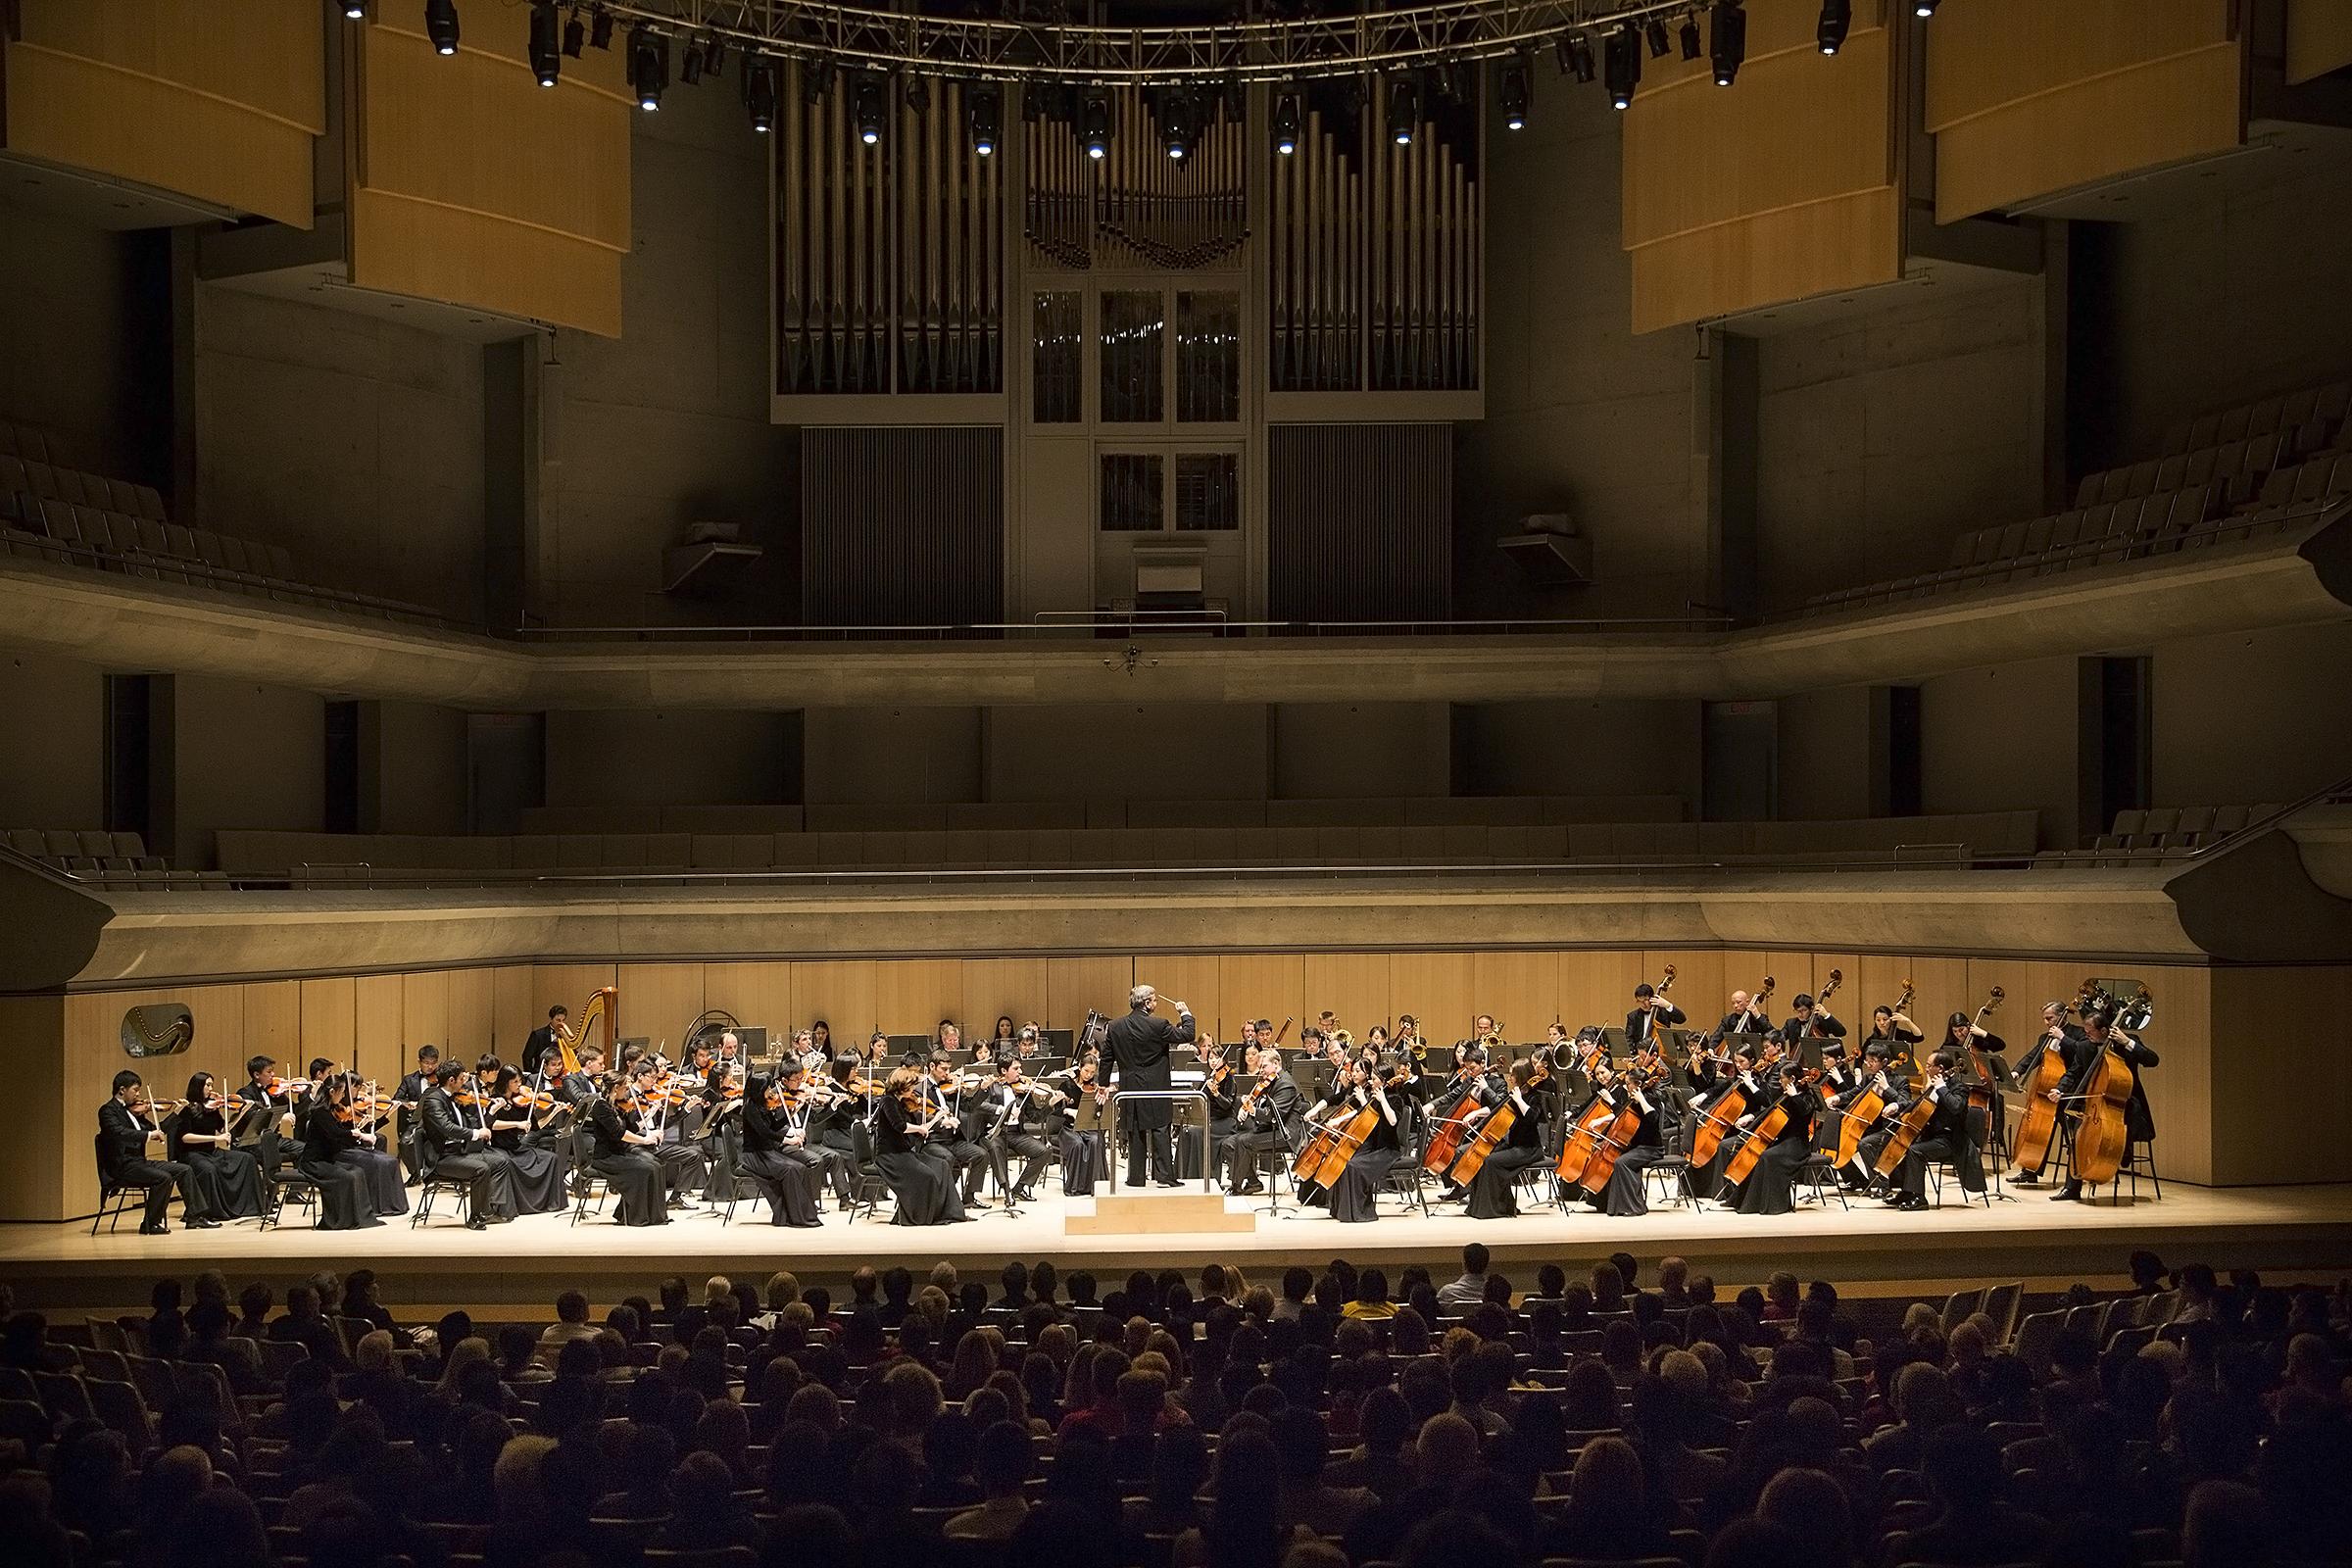 Shen Yun Symphony Orchestra 'Calming,' Says Arts Publicist